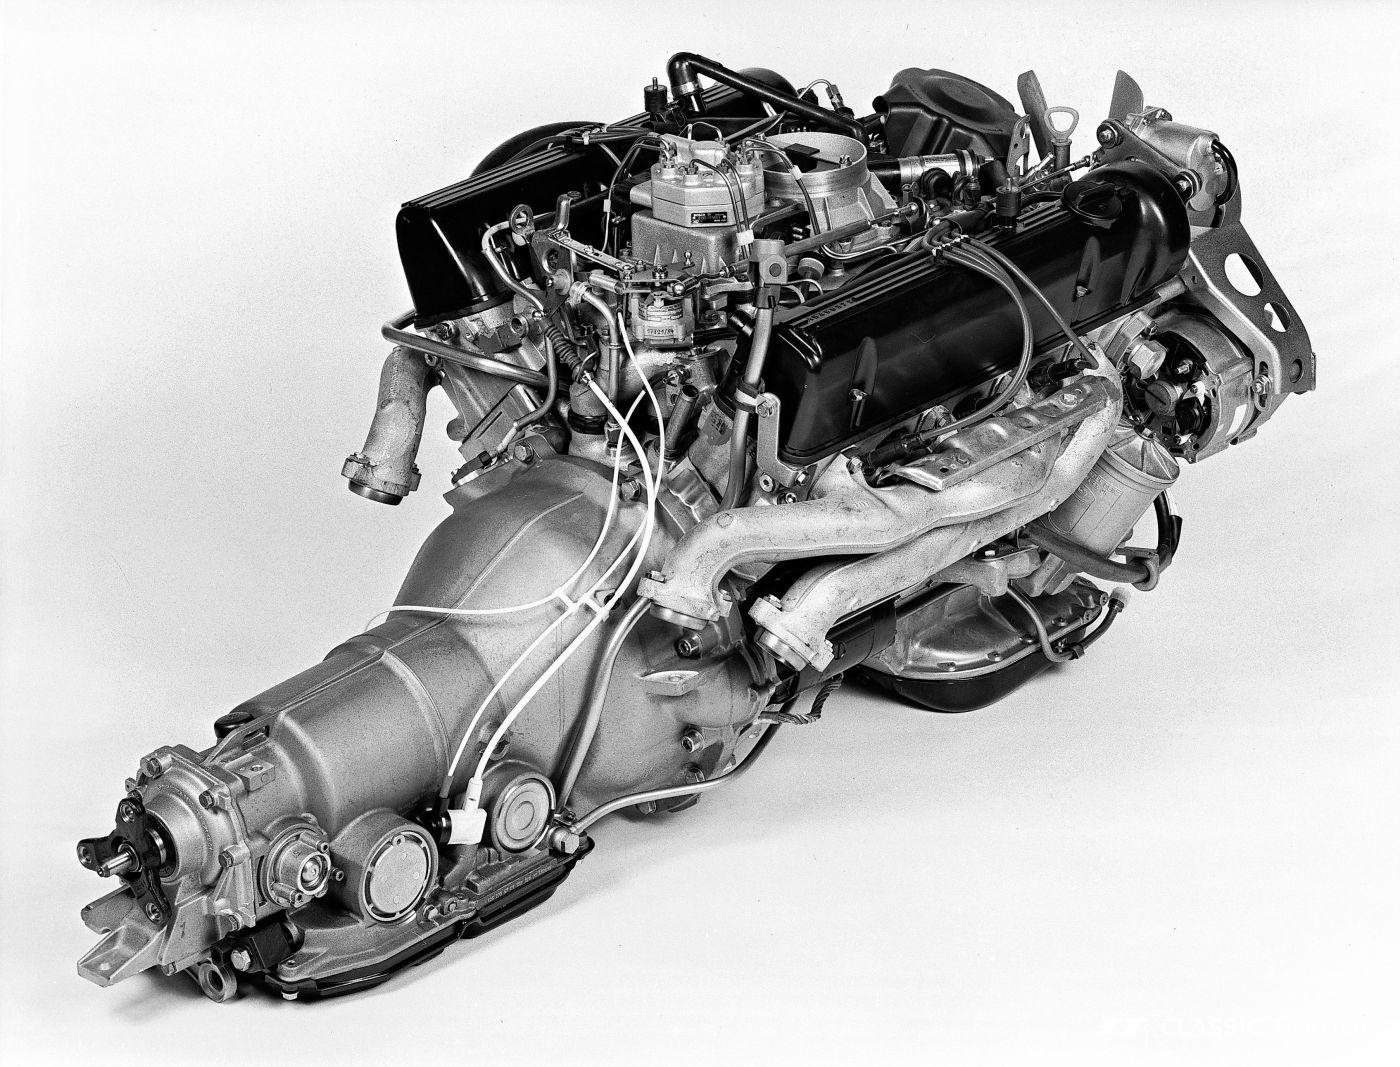 Mercedes-Benz W 126 S Klasse Motor M 117